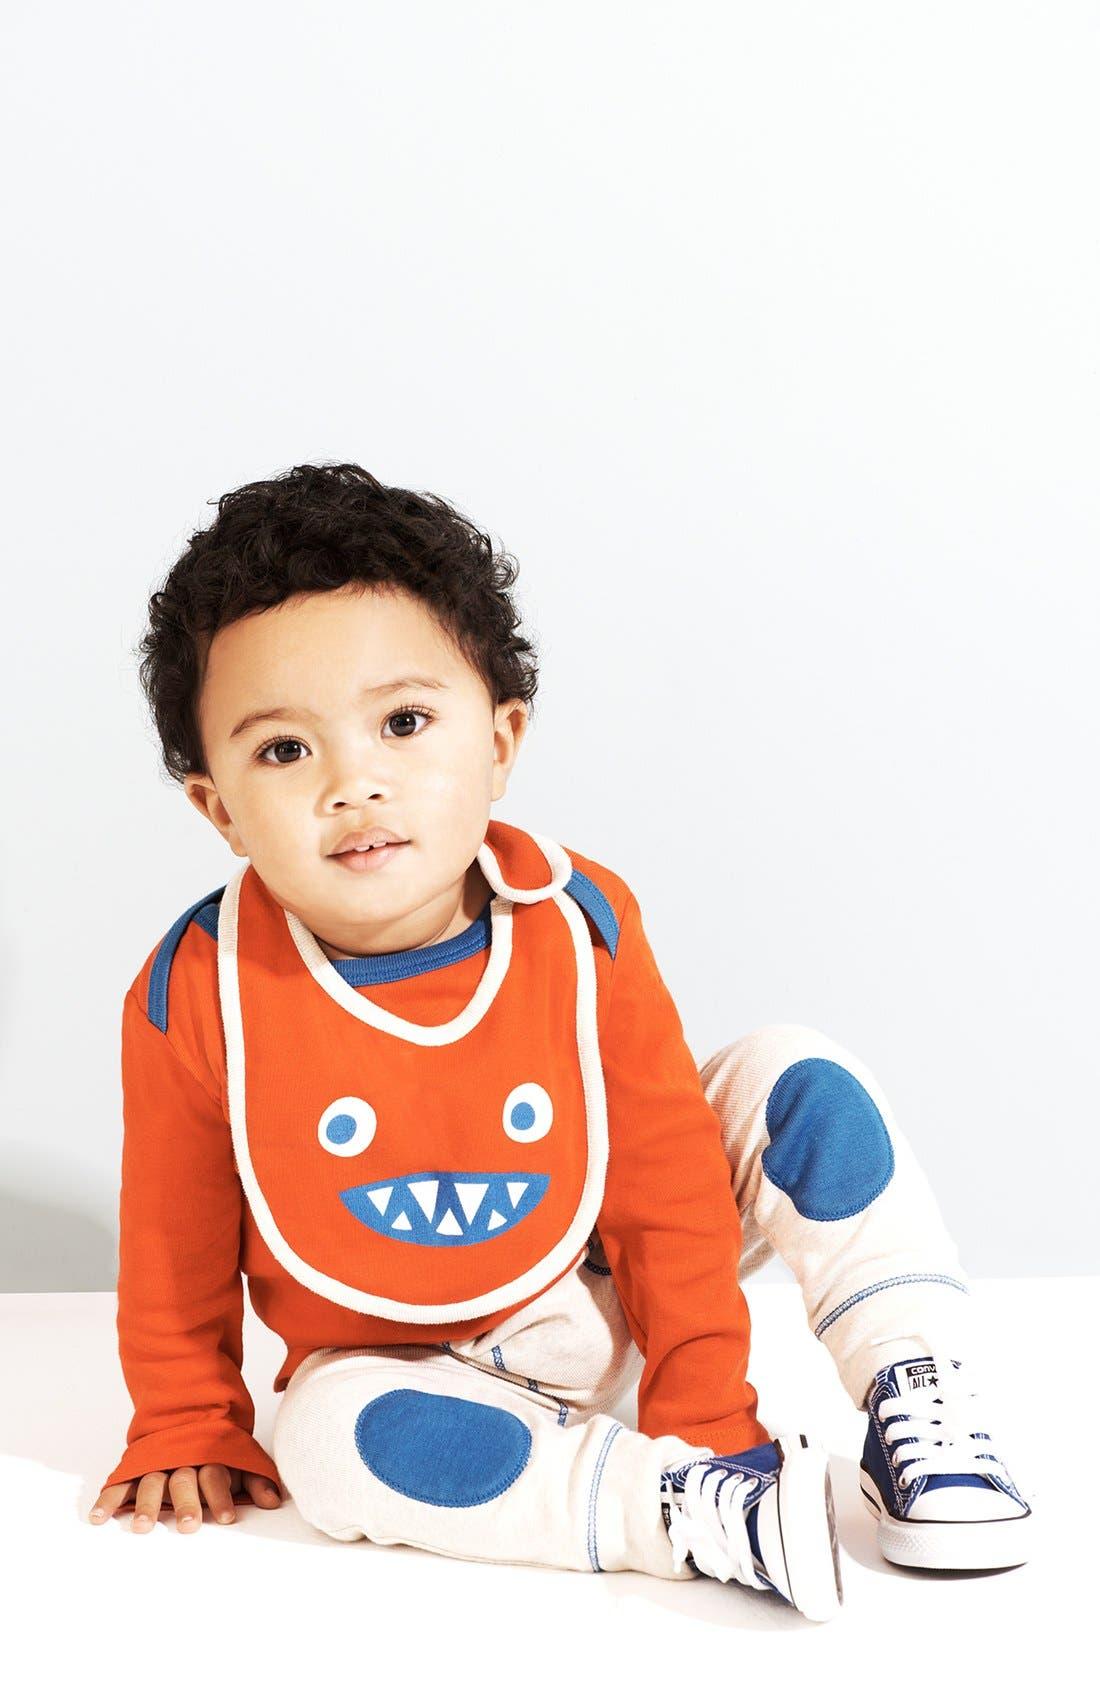 Alternate Image 1 Selected - Stem Baby Cotton Shirt, Pants & Bib (Baby Boys)